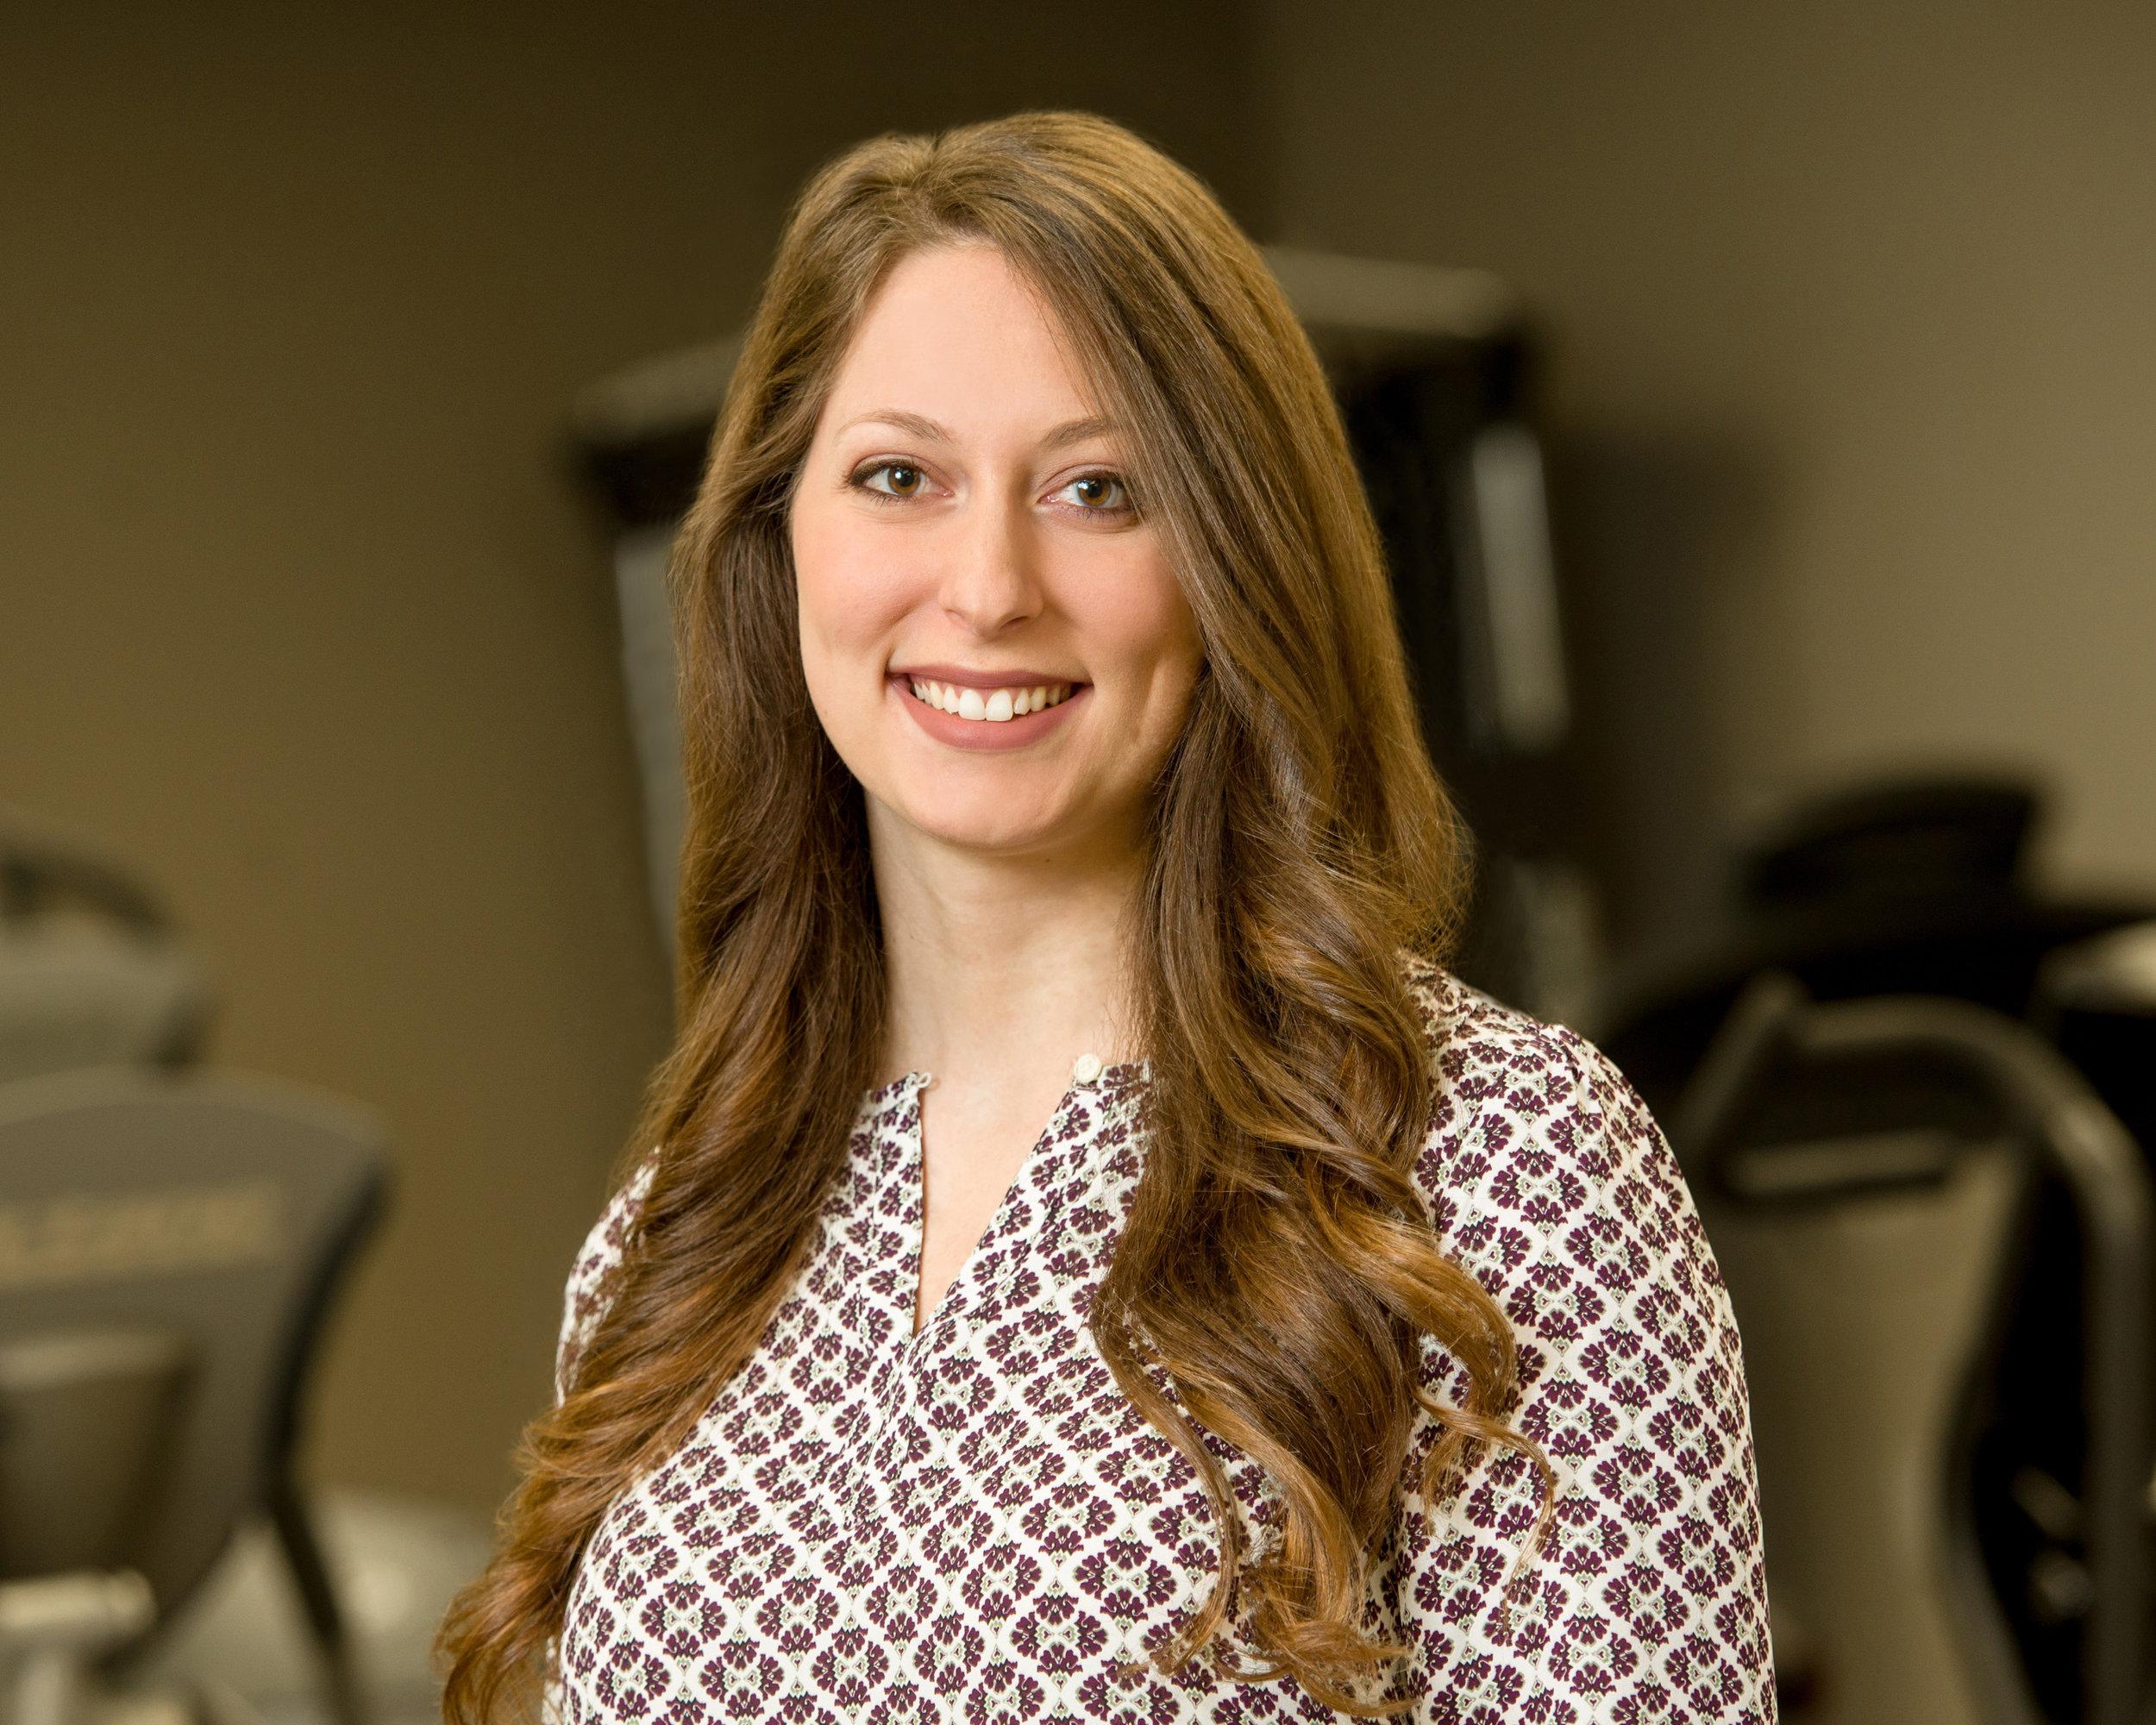 Rachel weaver - PT, DPT, Staff Physical Therapist